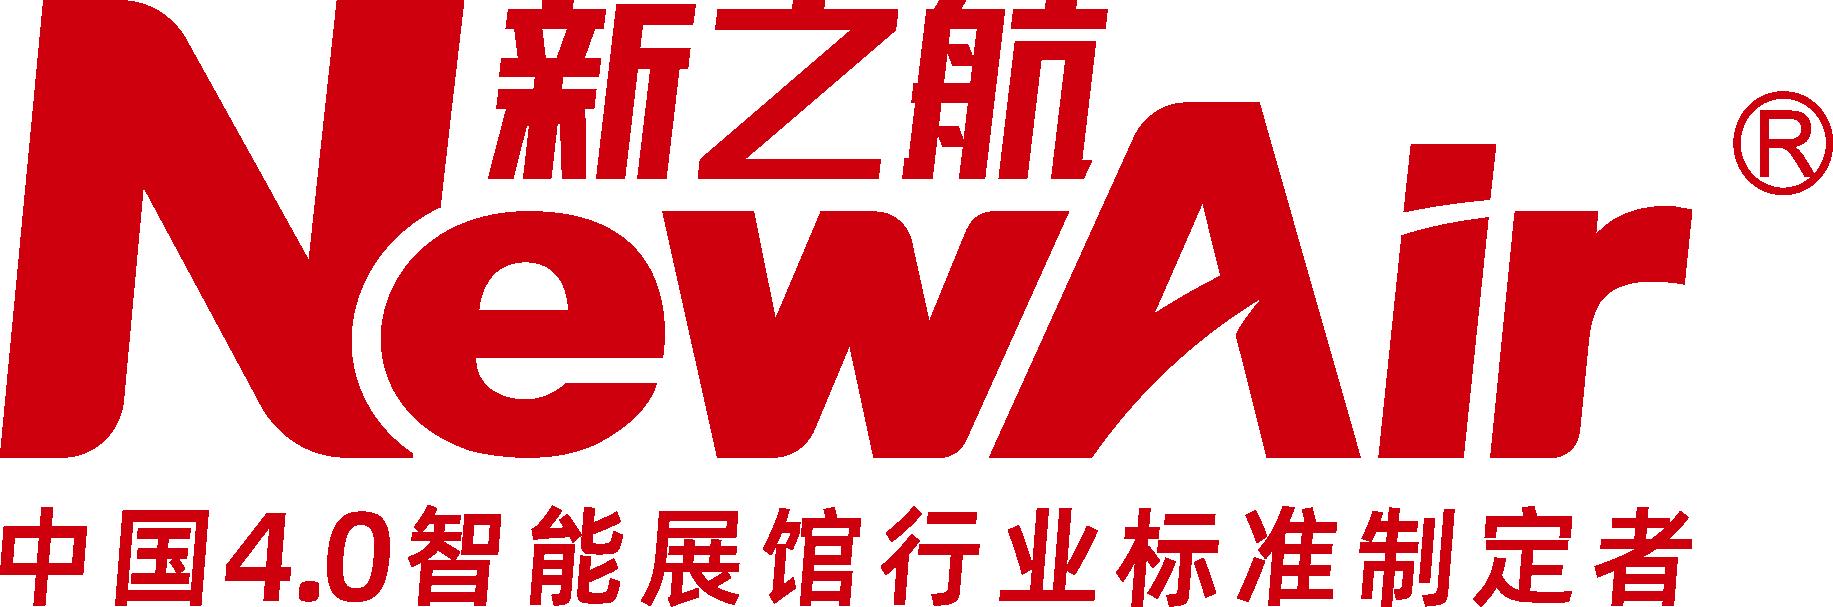 betway必威官网登陆下载传媒科技集团有限公司